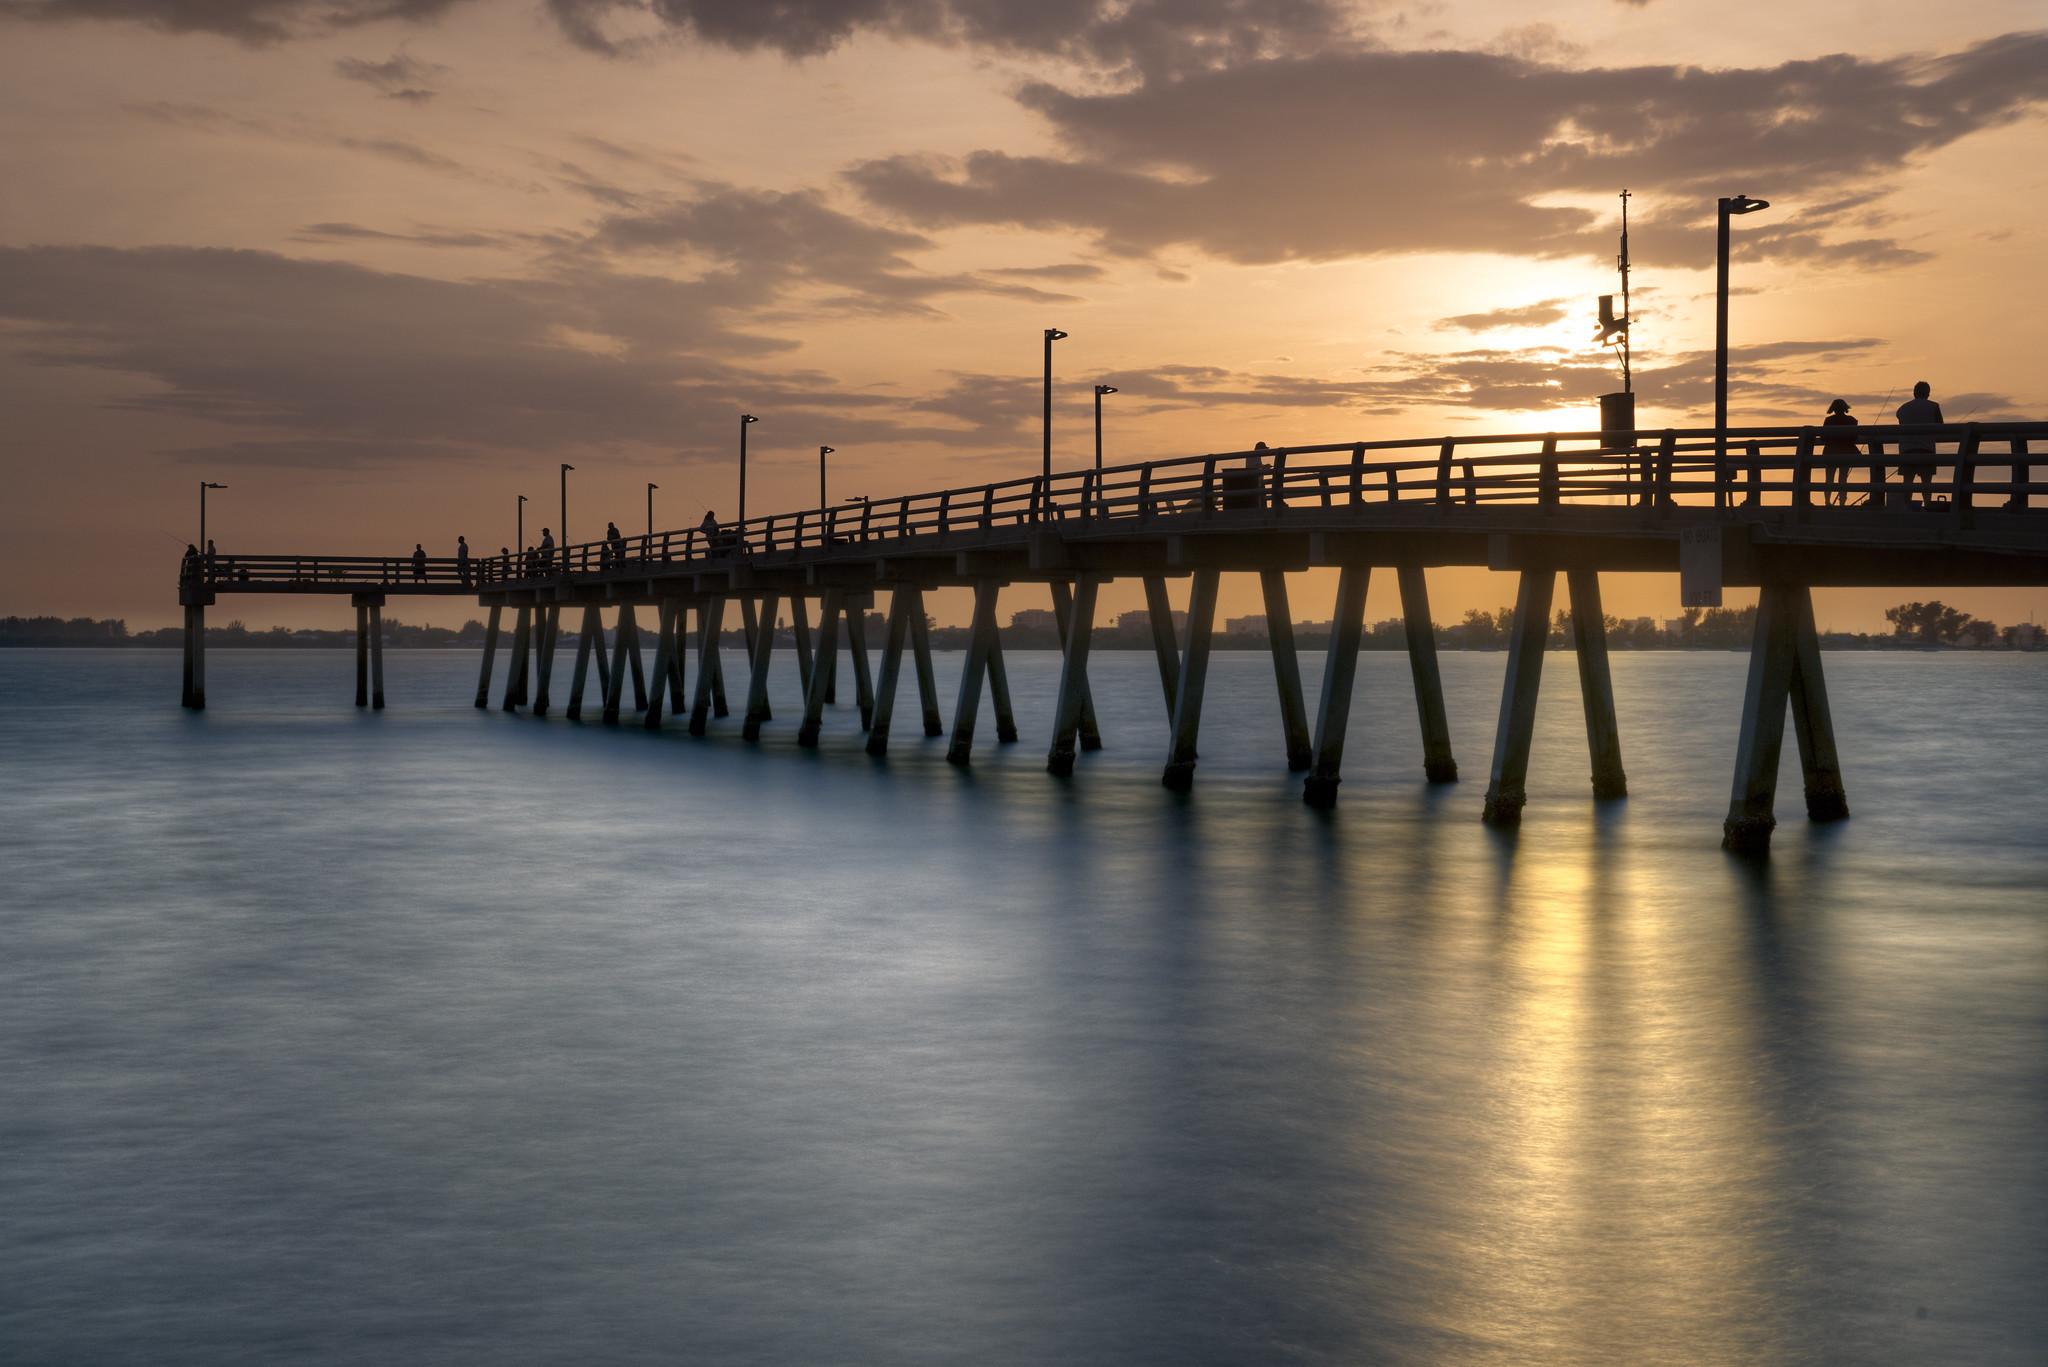 Sarasota bay fishing pier flickr photo sharing for Sarasota fishing pier